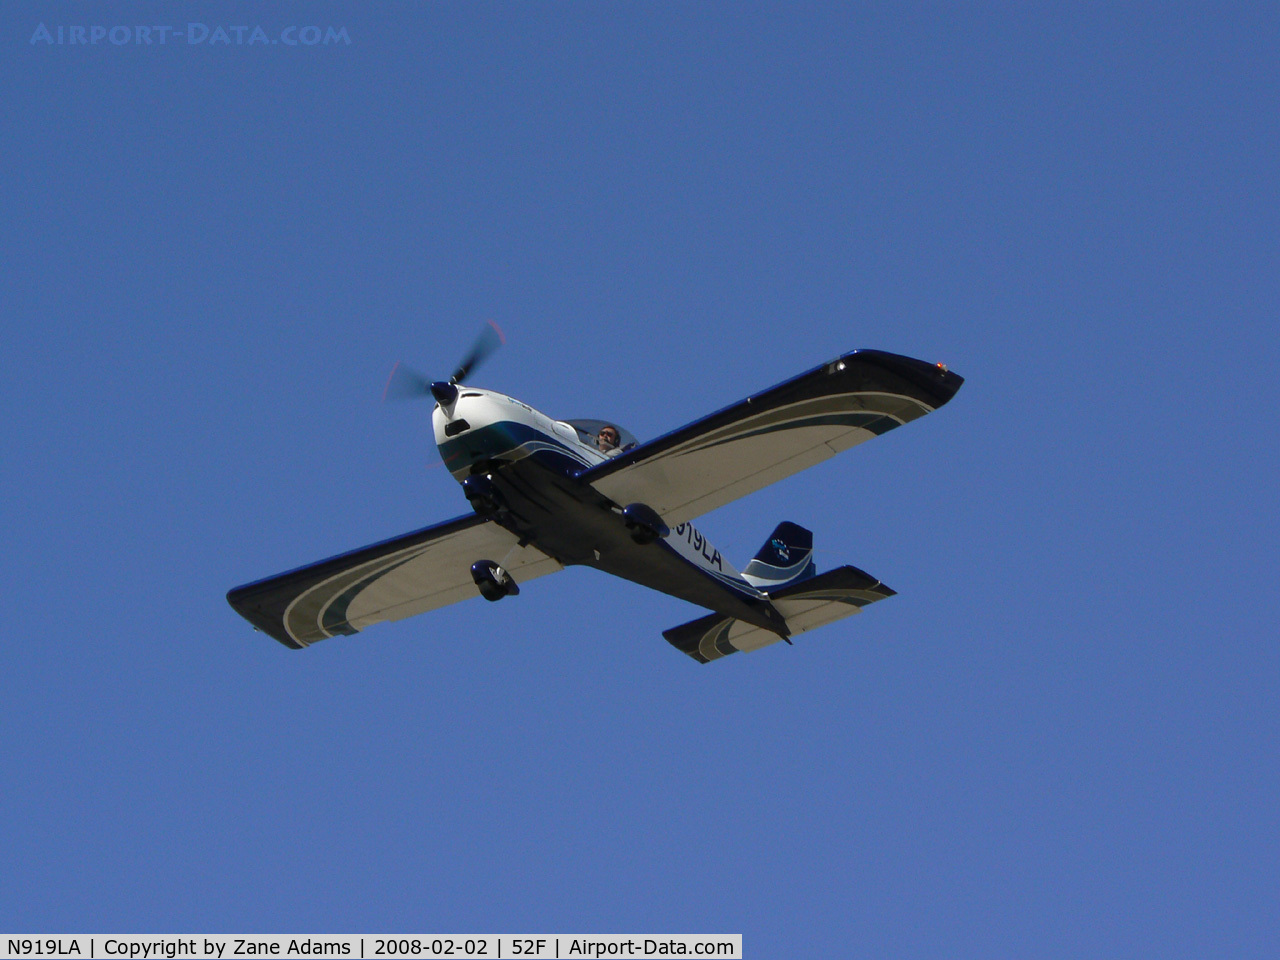 N919LA, 2007 Evektor-Aerotechnik SPORTSTAR PLUS C/N 20070919, Light Sport - At Aero Valley (Northwest Regional)